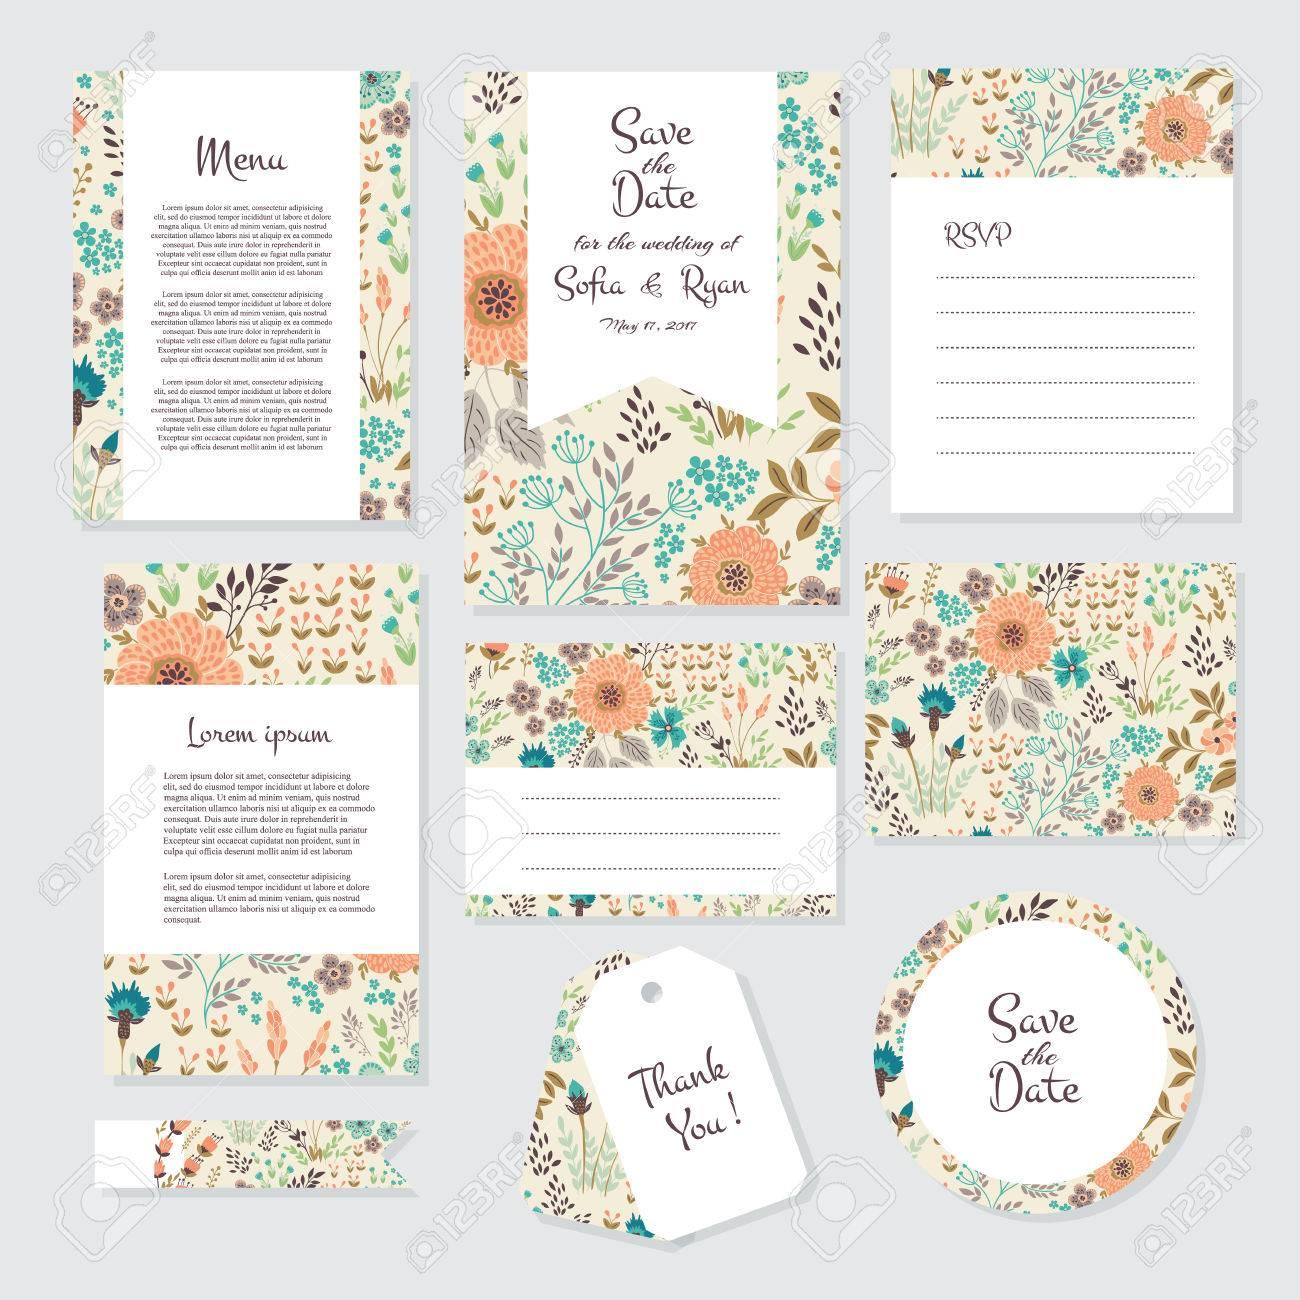 Vector Gentle Wedding Cards Template With Flower Design. Wedding ...